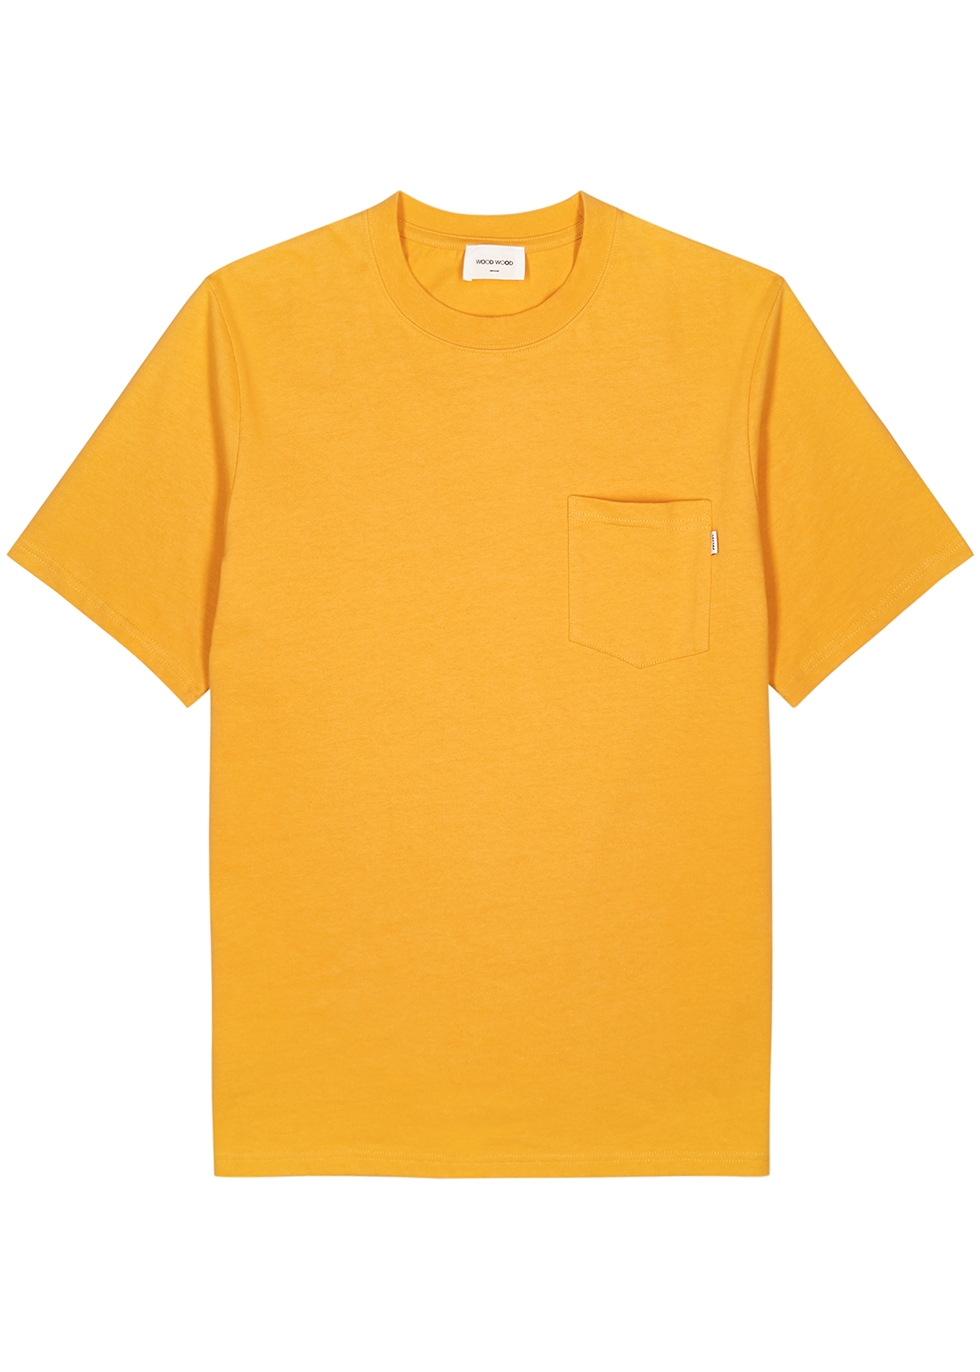 Bobby orange cotton T-shirt